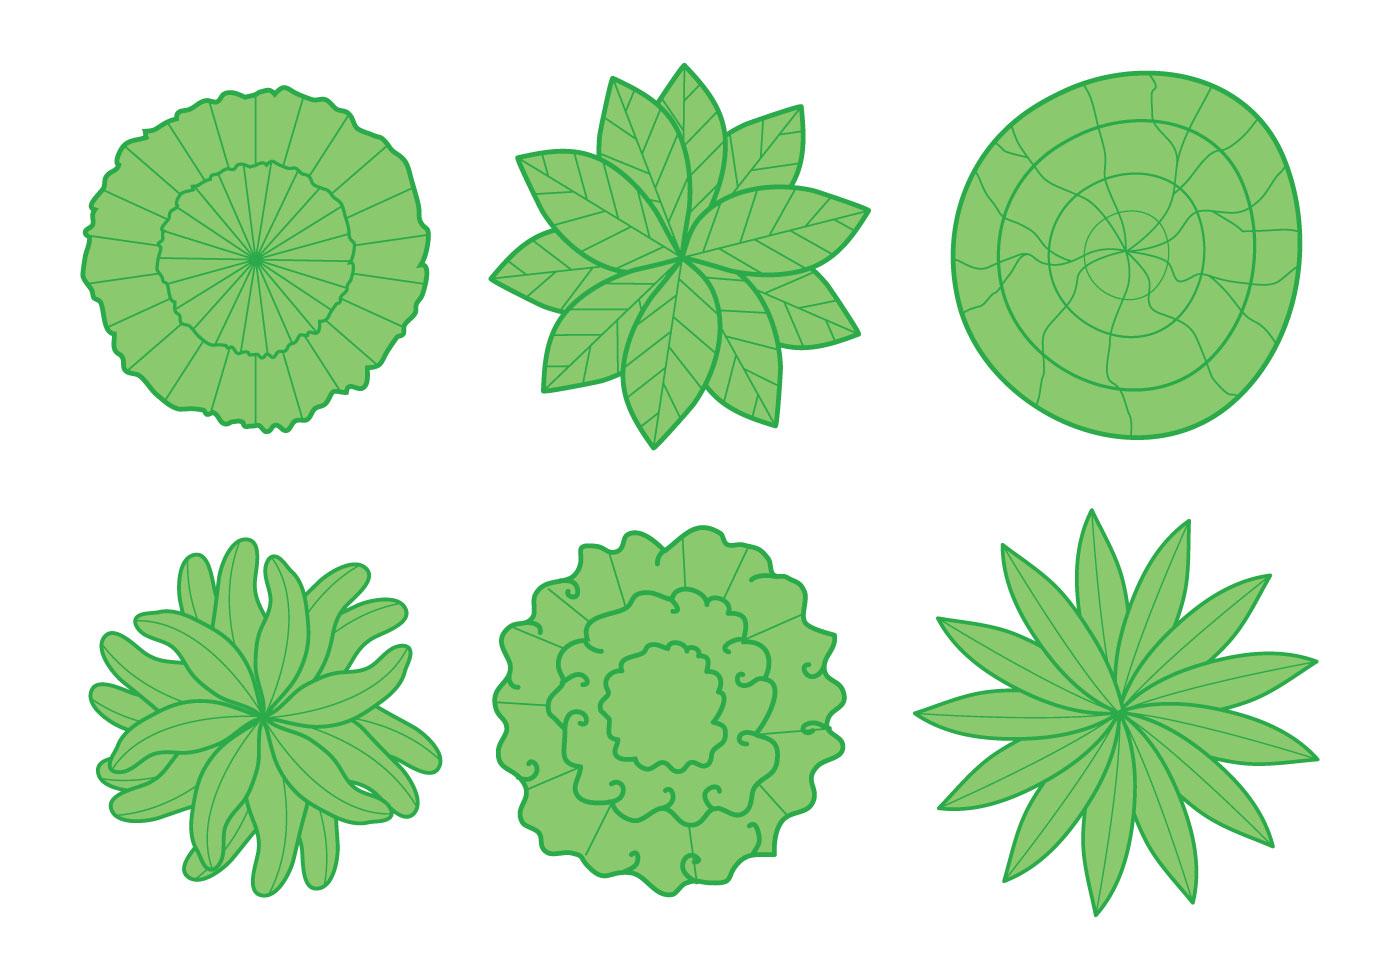 Plant Top View Vector - Download Free Vector Art, Stock Graphics ... for Plant Top View Vector  lp5fsj